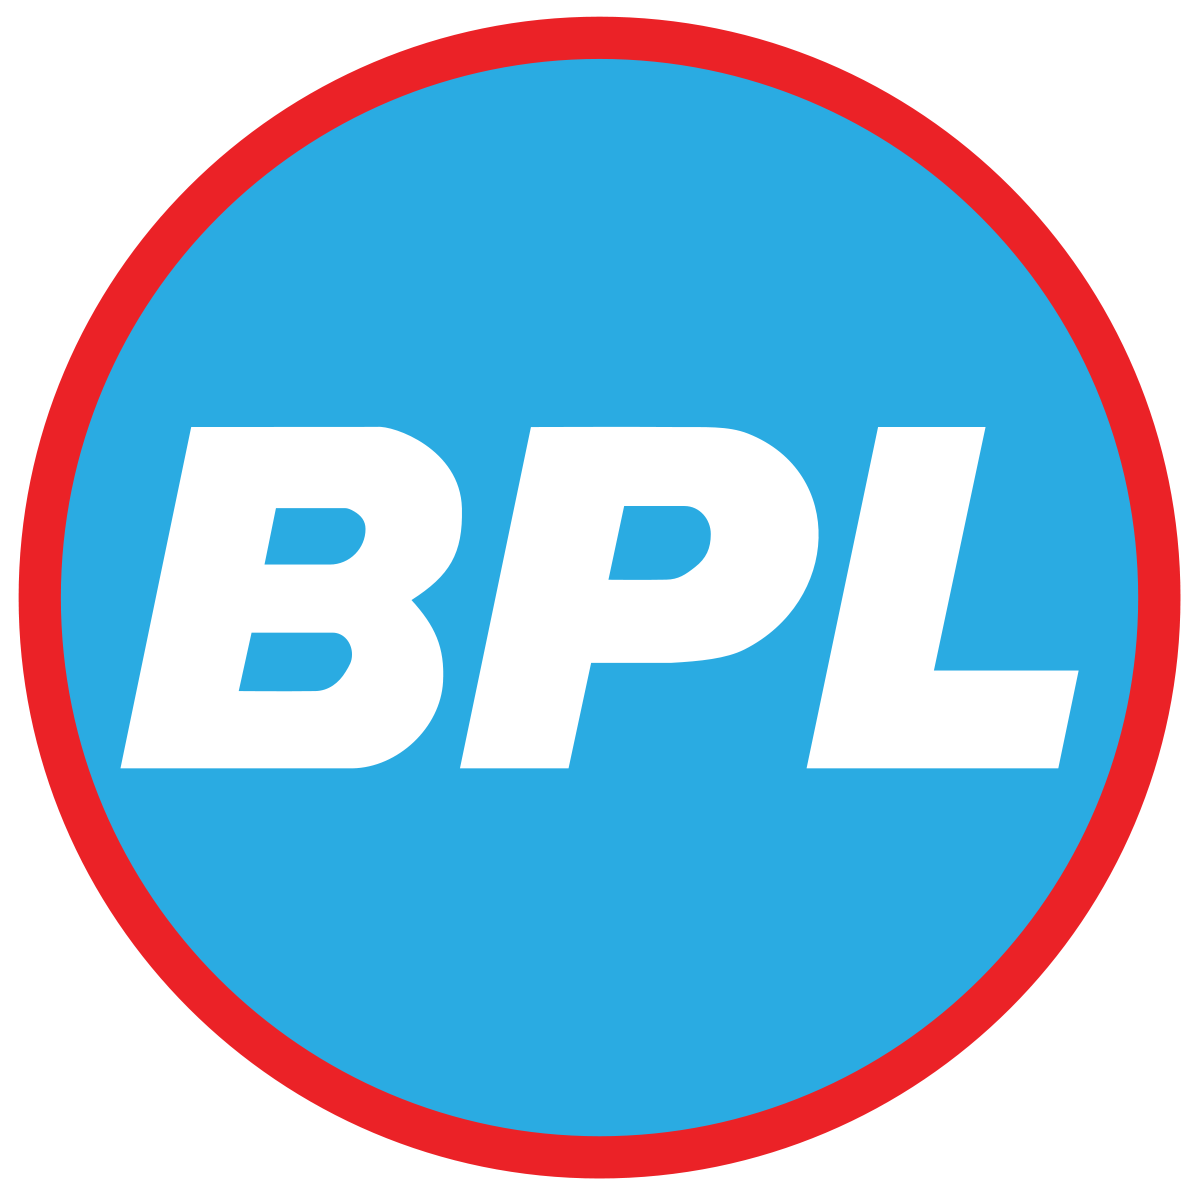 BPL LED TV customer care number India